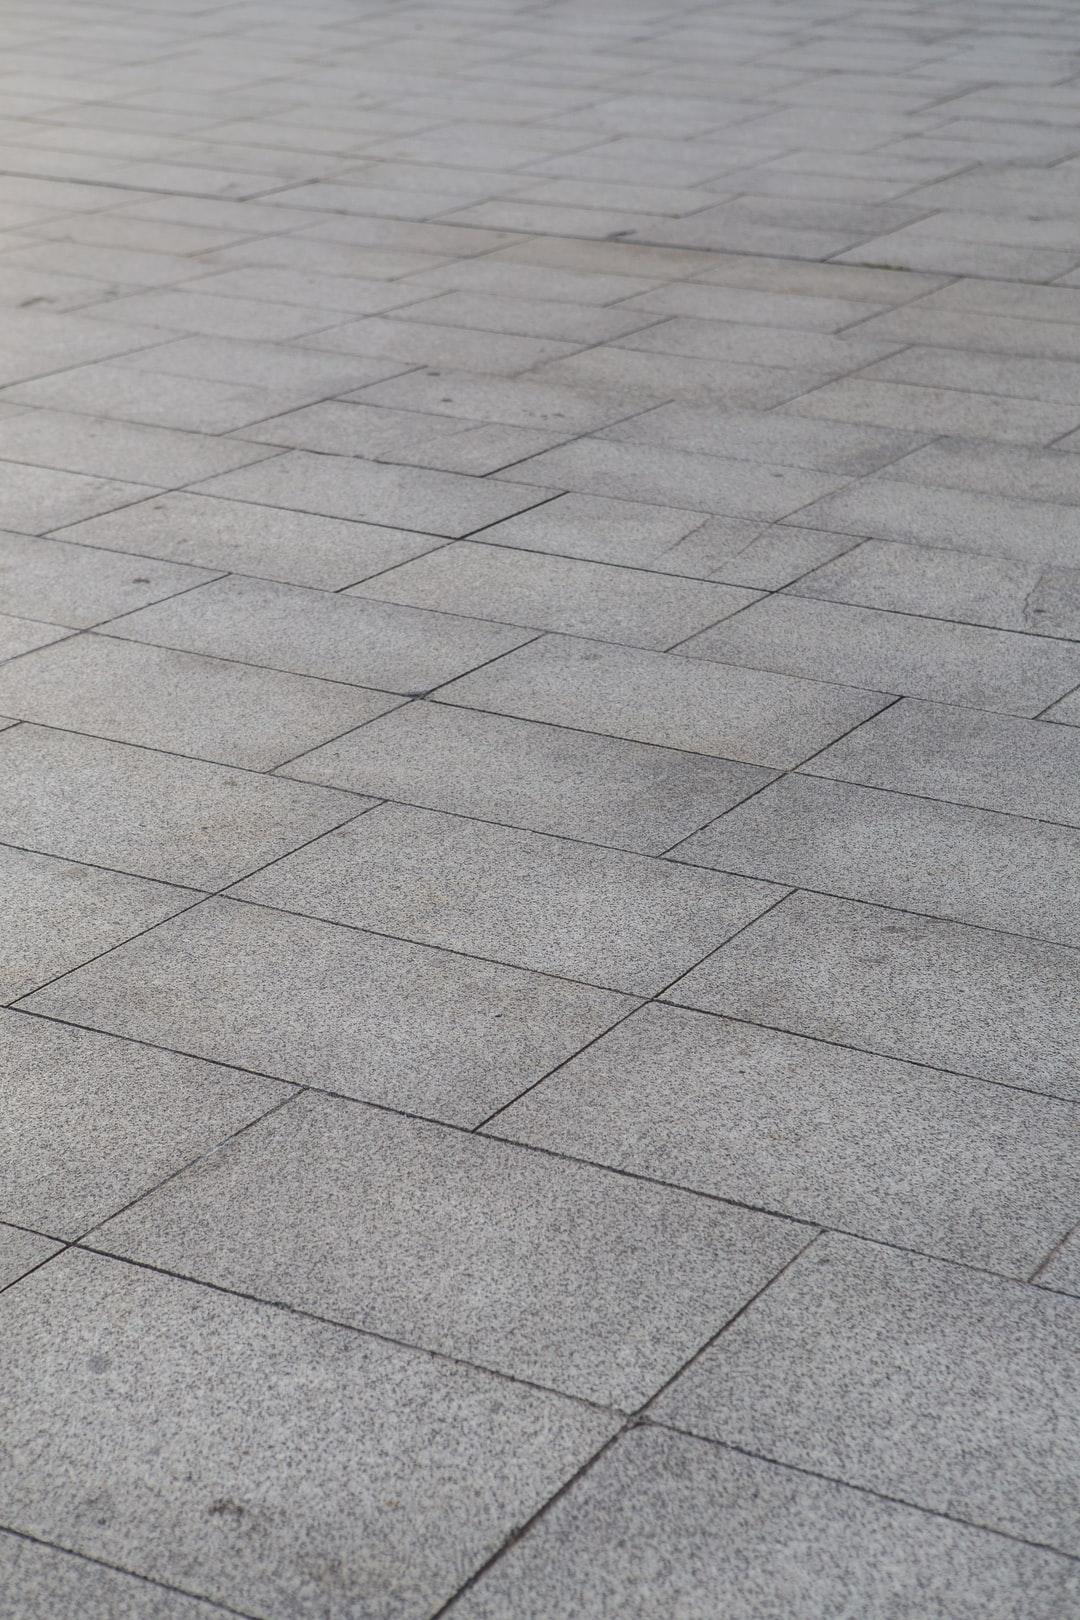 More-grey-pavers